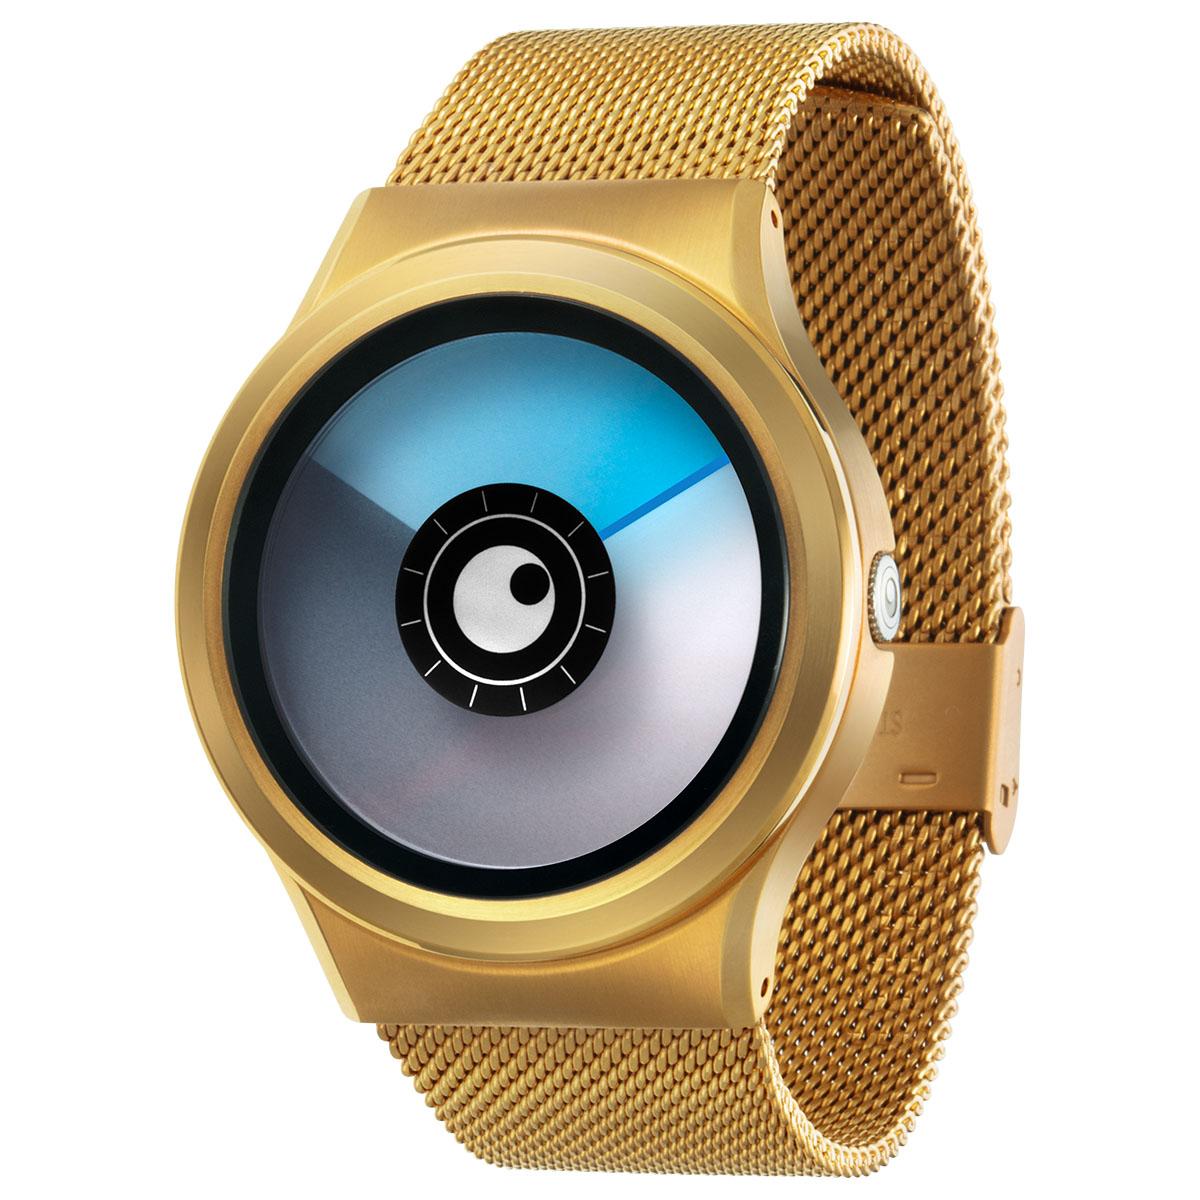 ZEROO AURORA BOREALIS ゼロ 電池式クォーツ 腕時計 [W12024B04SM04] ブルー デザインウォッチ ペア用 メンズ レディース ユニセックス おしゃれ時計 デザイナーズ